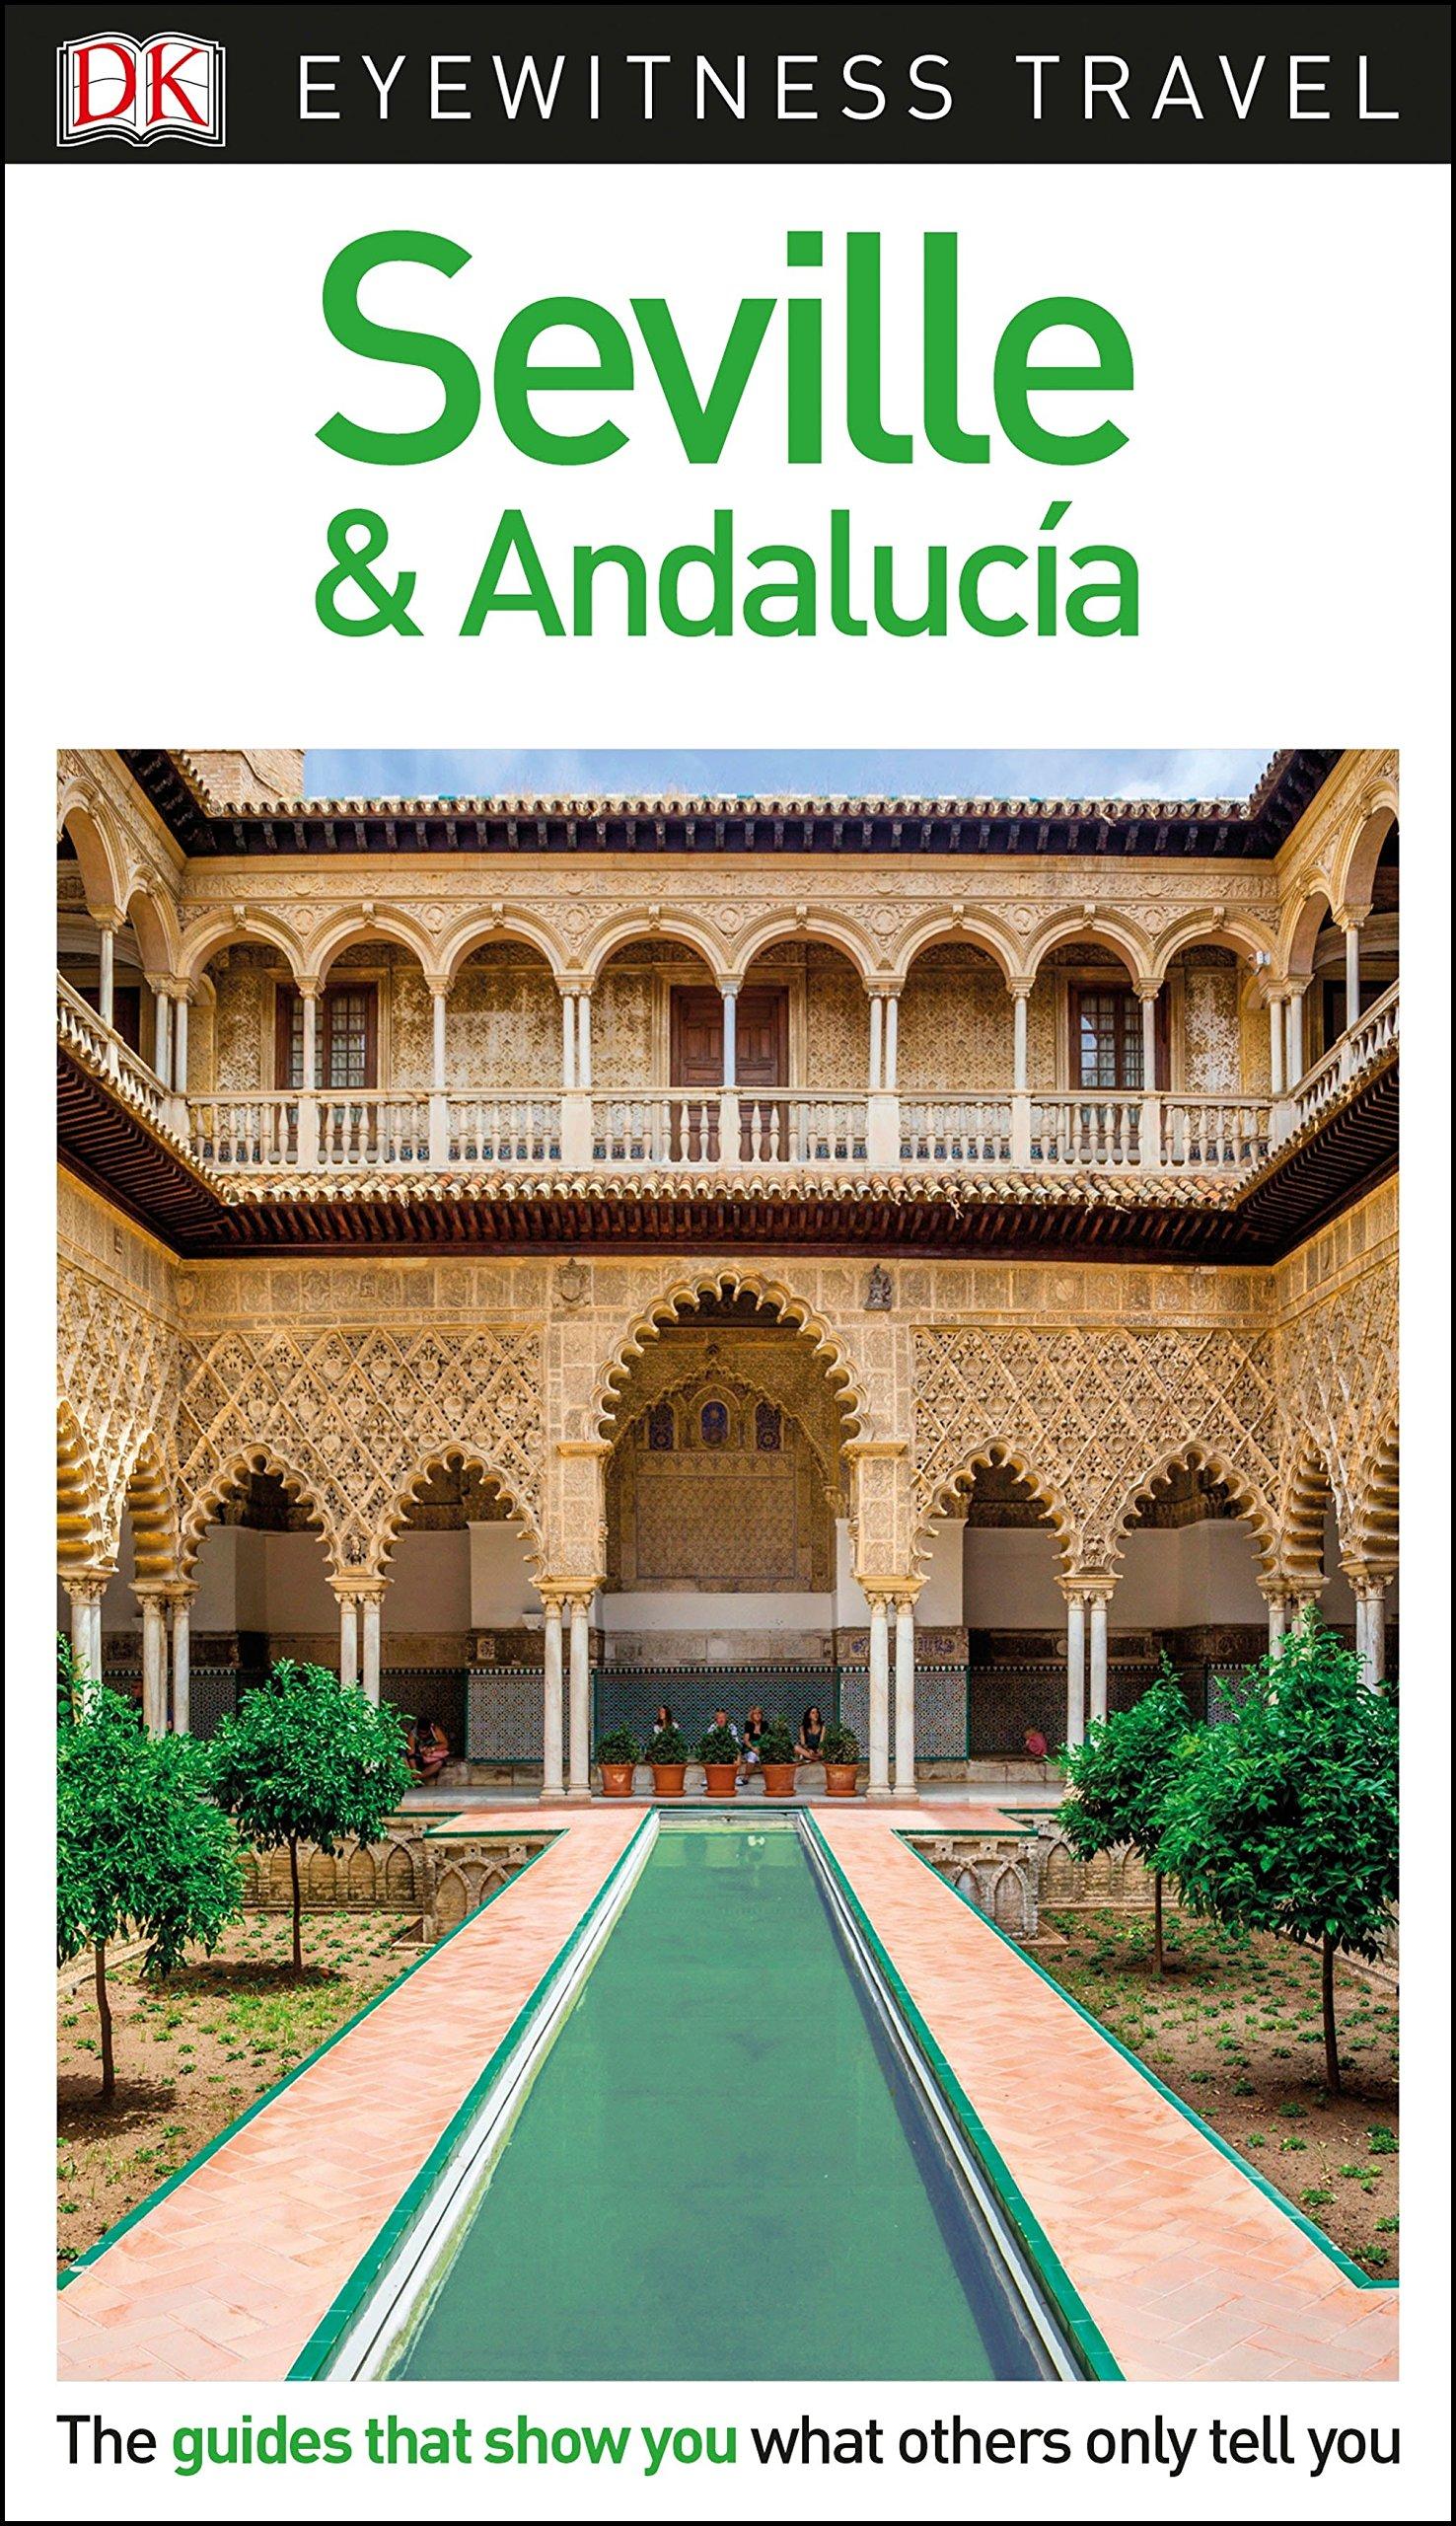 Amazing dk eyewitness travel guide seville and andaluca dk travel amazoncom books with edg santa - De gasperi santa maria di sala ...